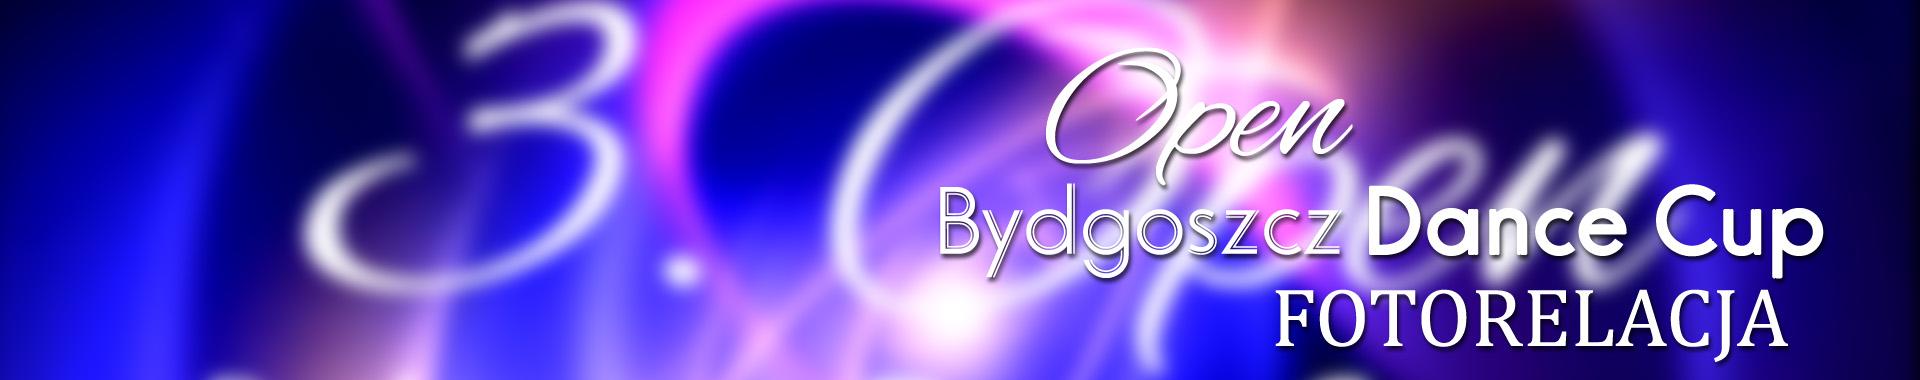 BYDGOSZCZ DANCE CUP